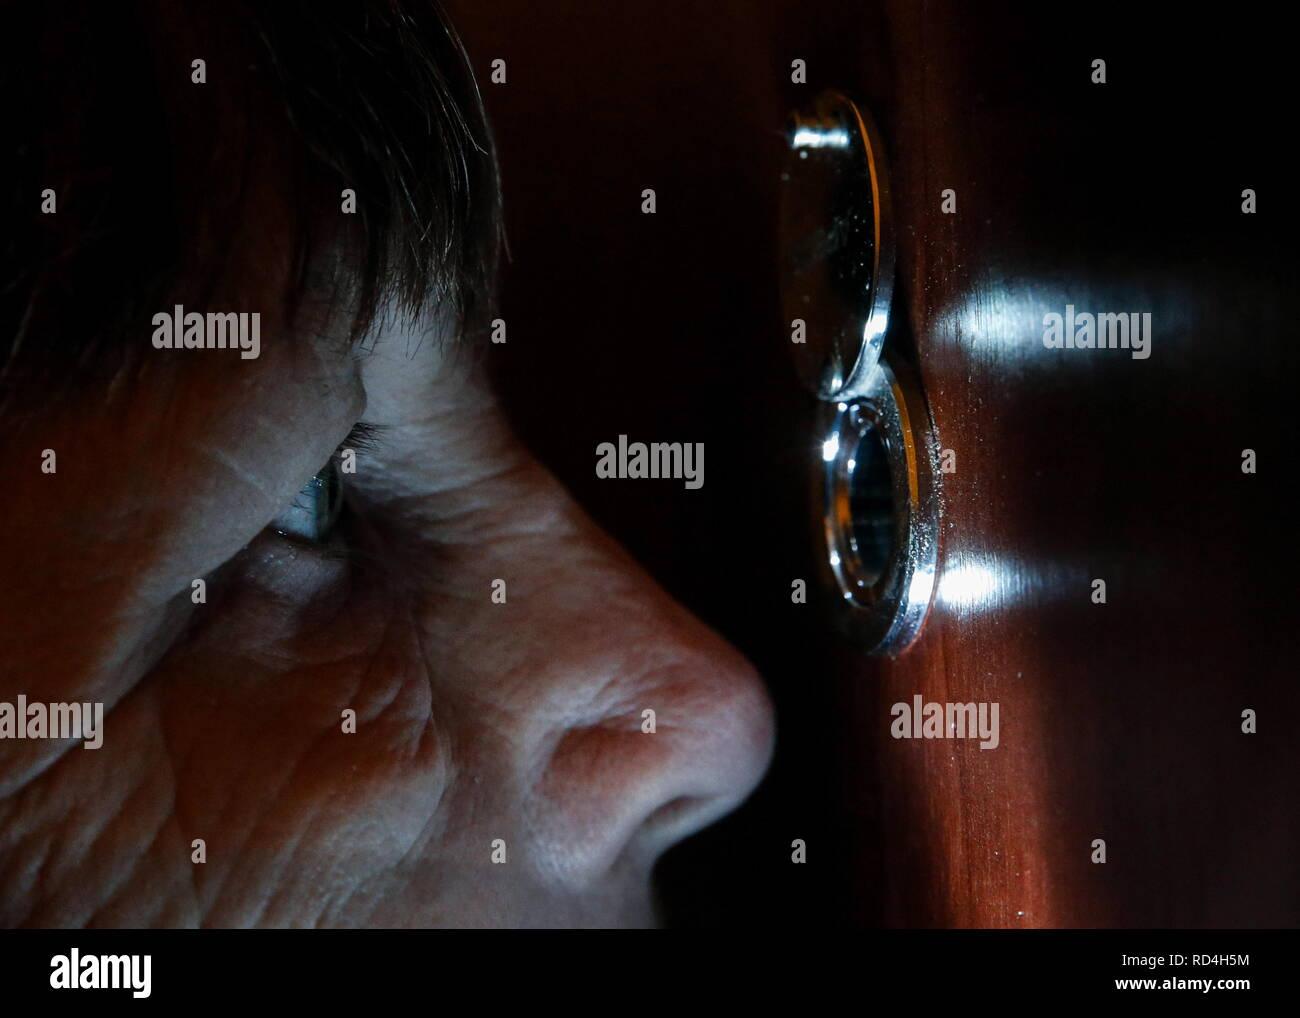 ROSTOV-ON-DON, RUSSIA - JANUARY 10, 2019: A woman looks through a peephole. Valery Matytsin/TASS - Stock Image